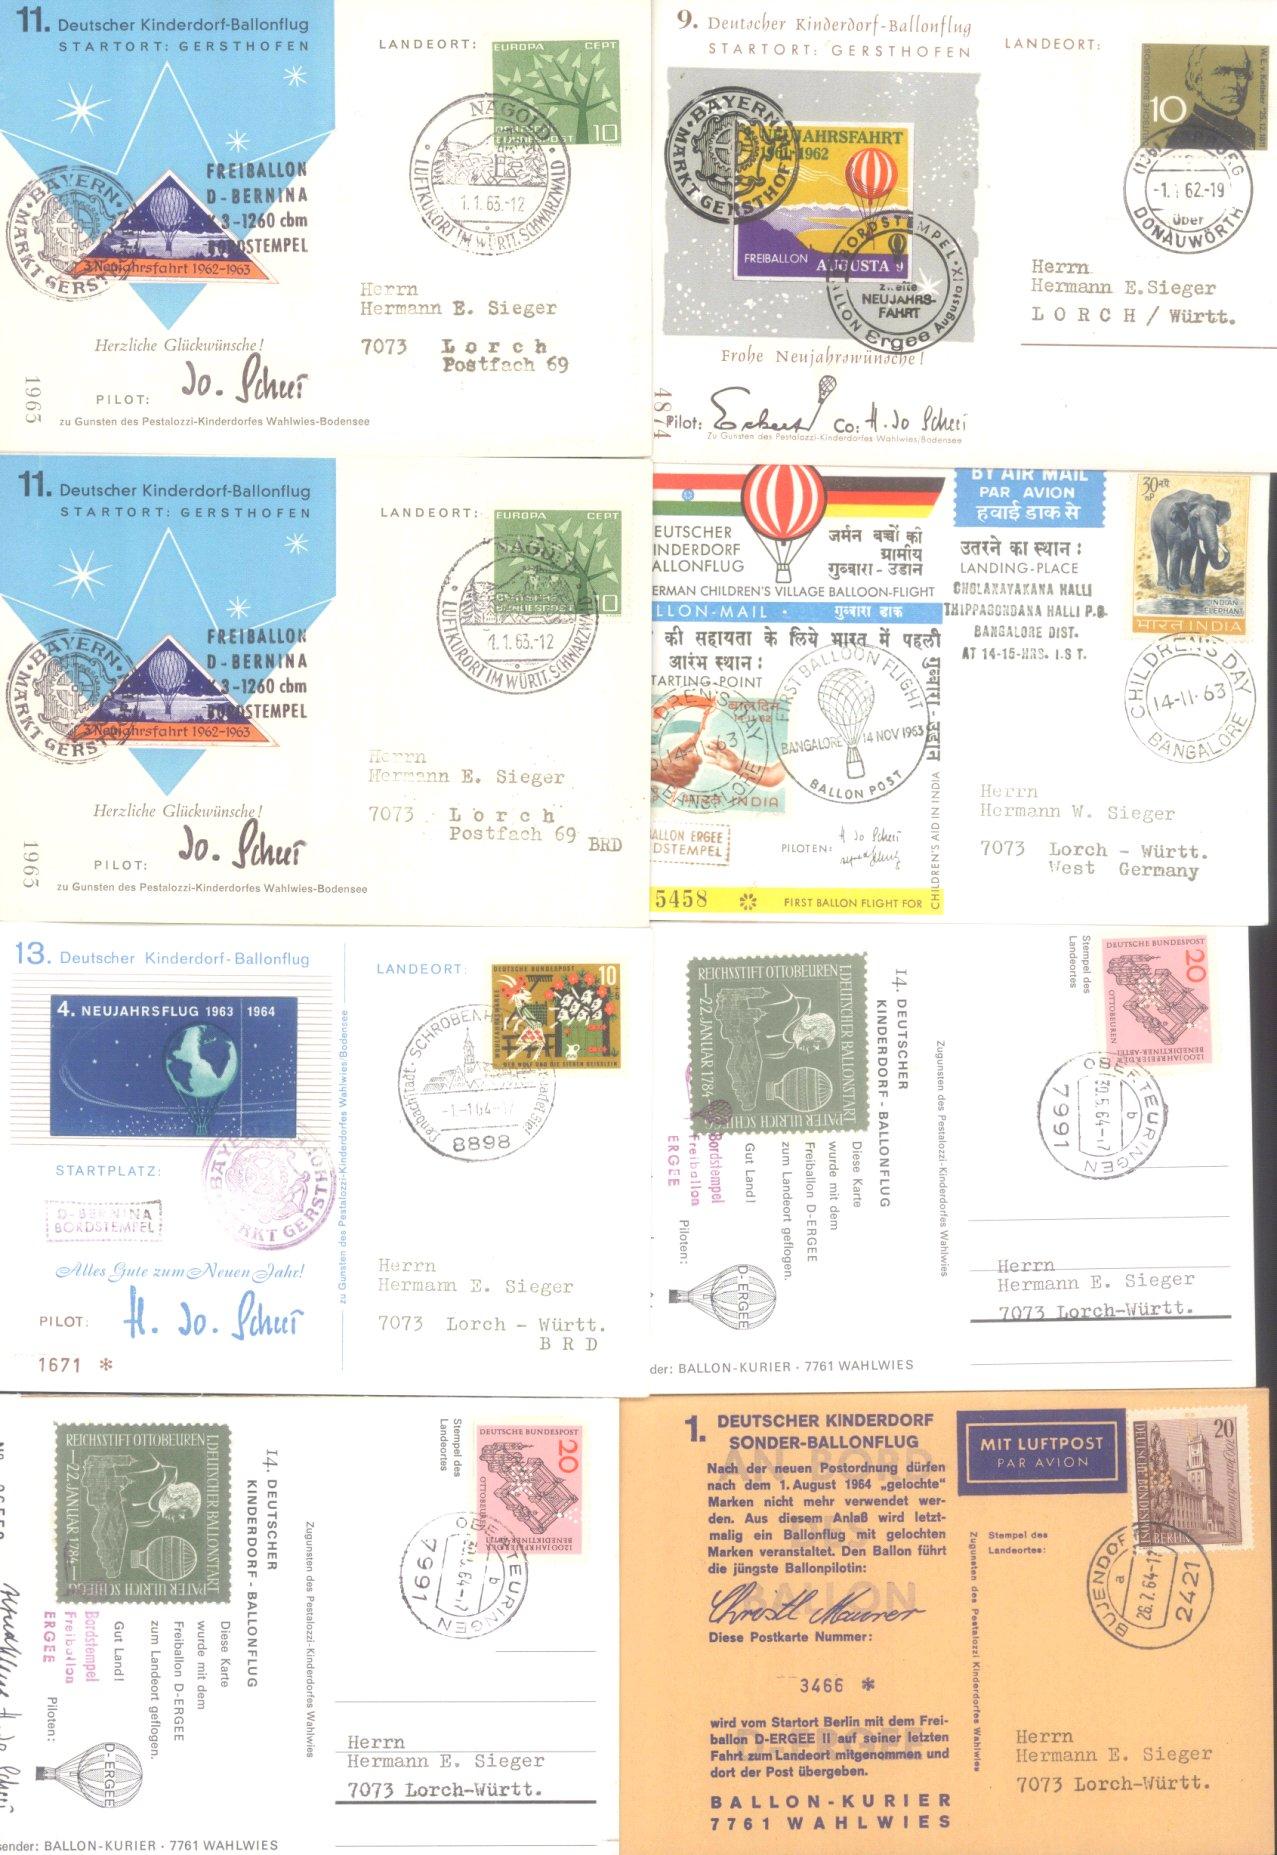 MOTIV BALLONPOST / KINDERDORF BALLONPOST 1952-1972-2